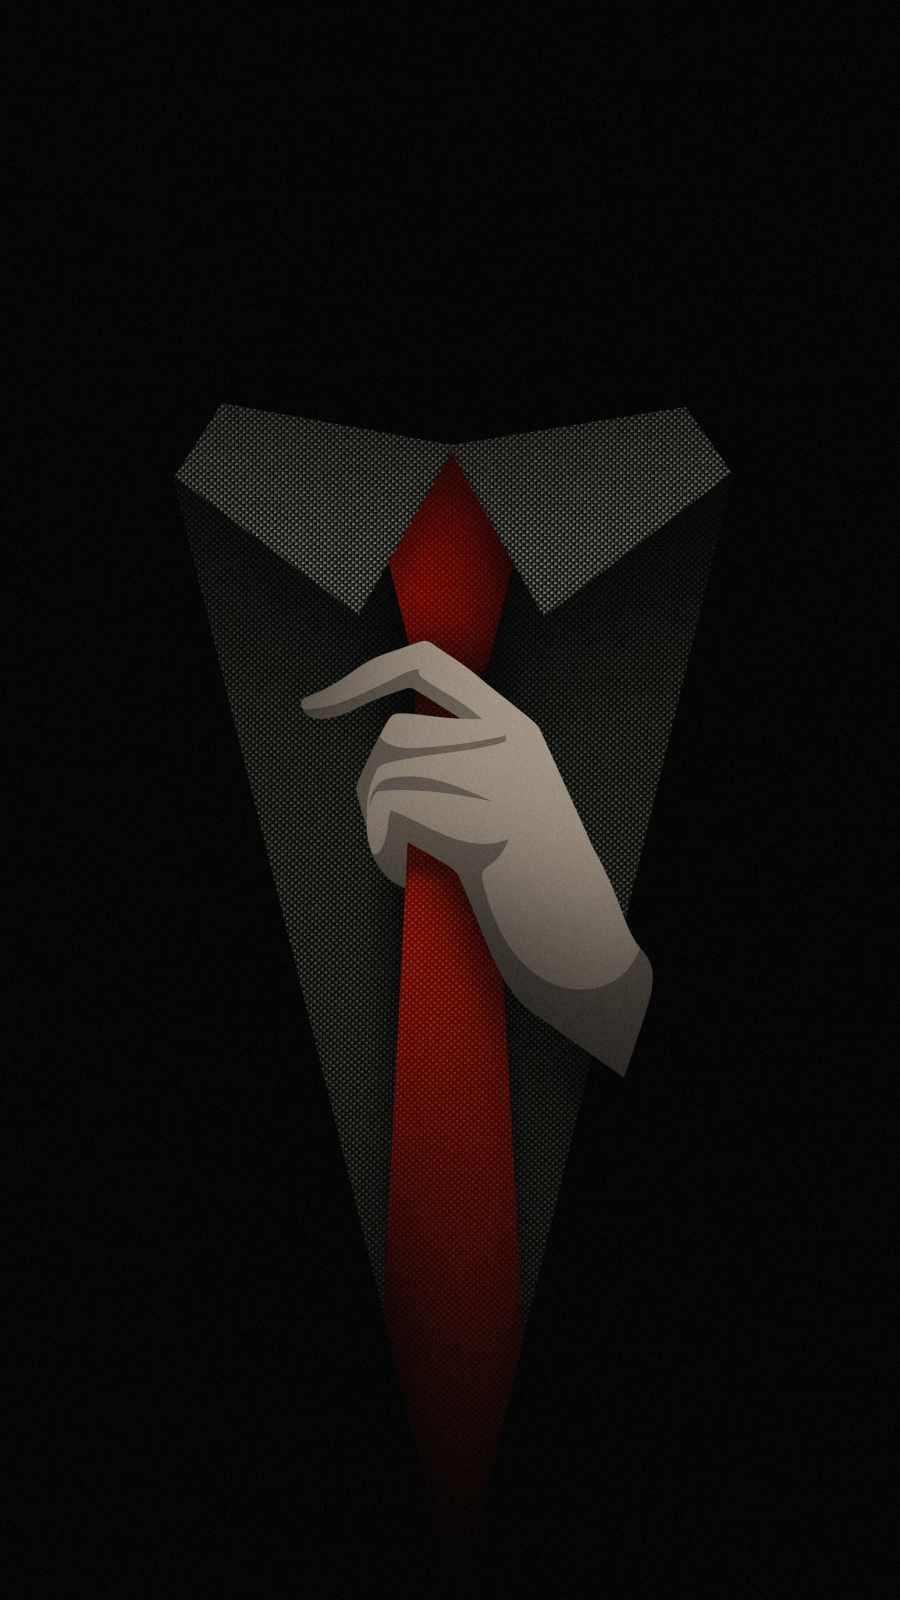 Suit and Tie iPhone Wallpaper